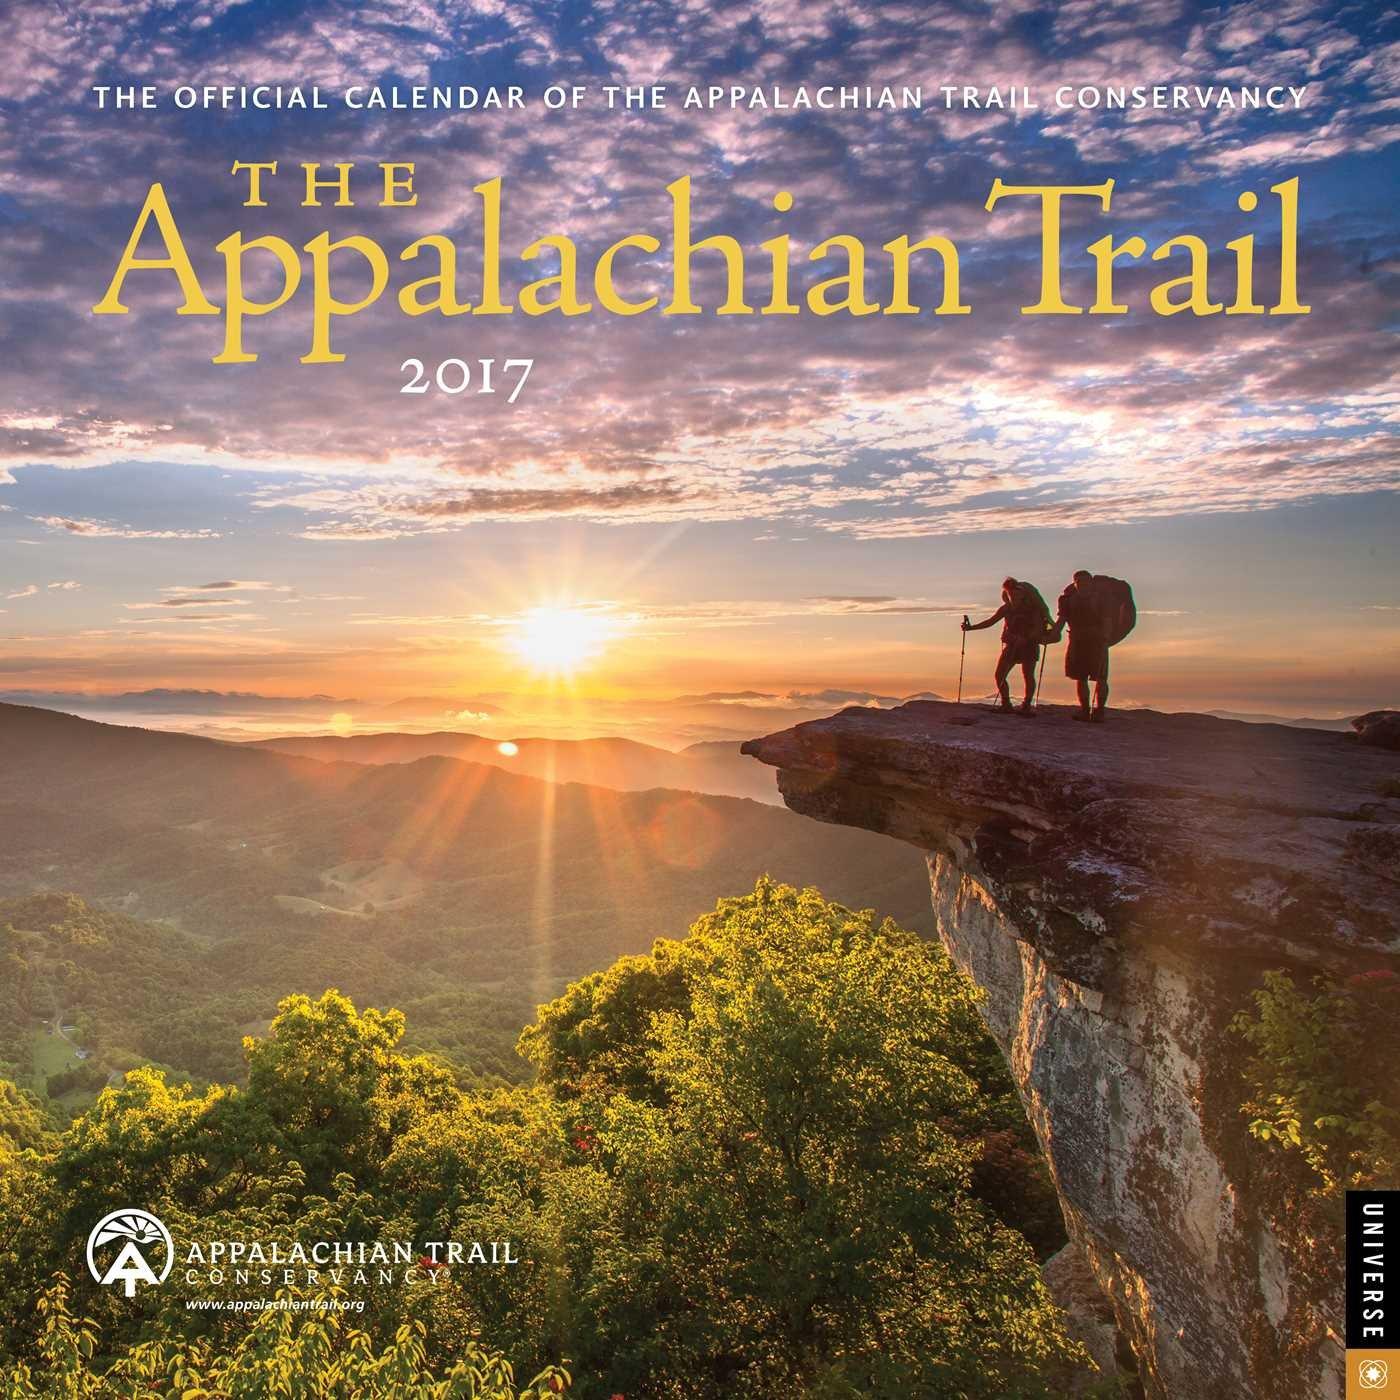 Appalachian Trail 2017 Wall Calendar